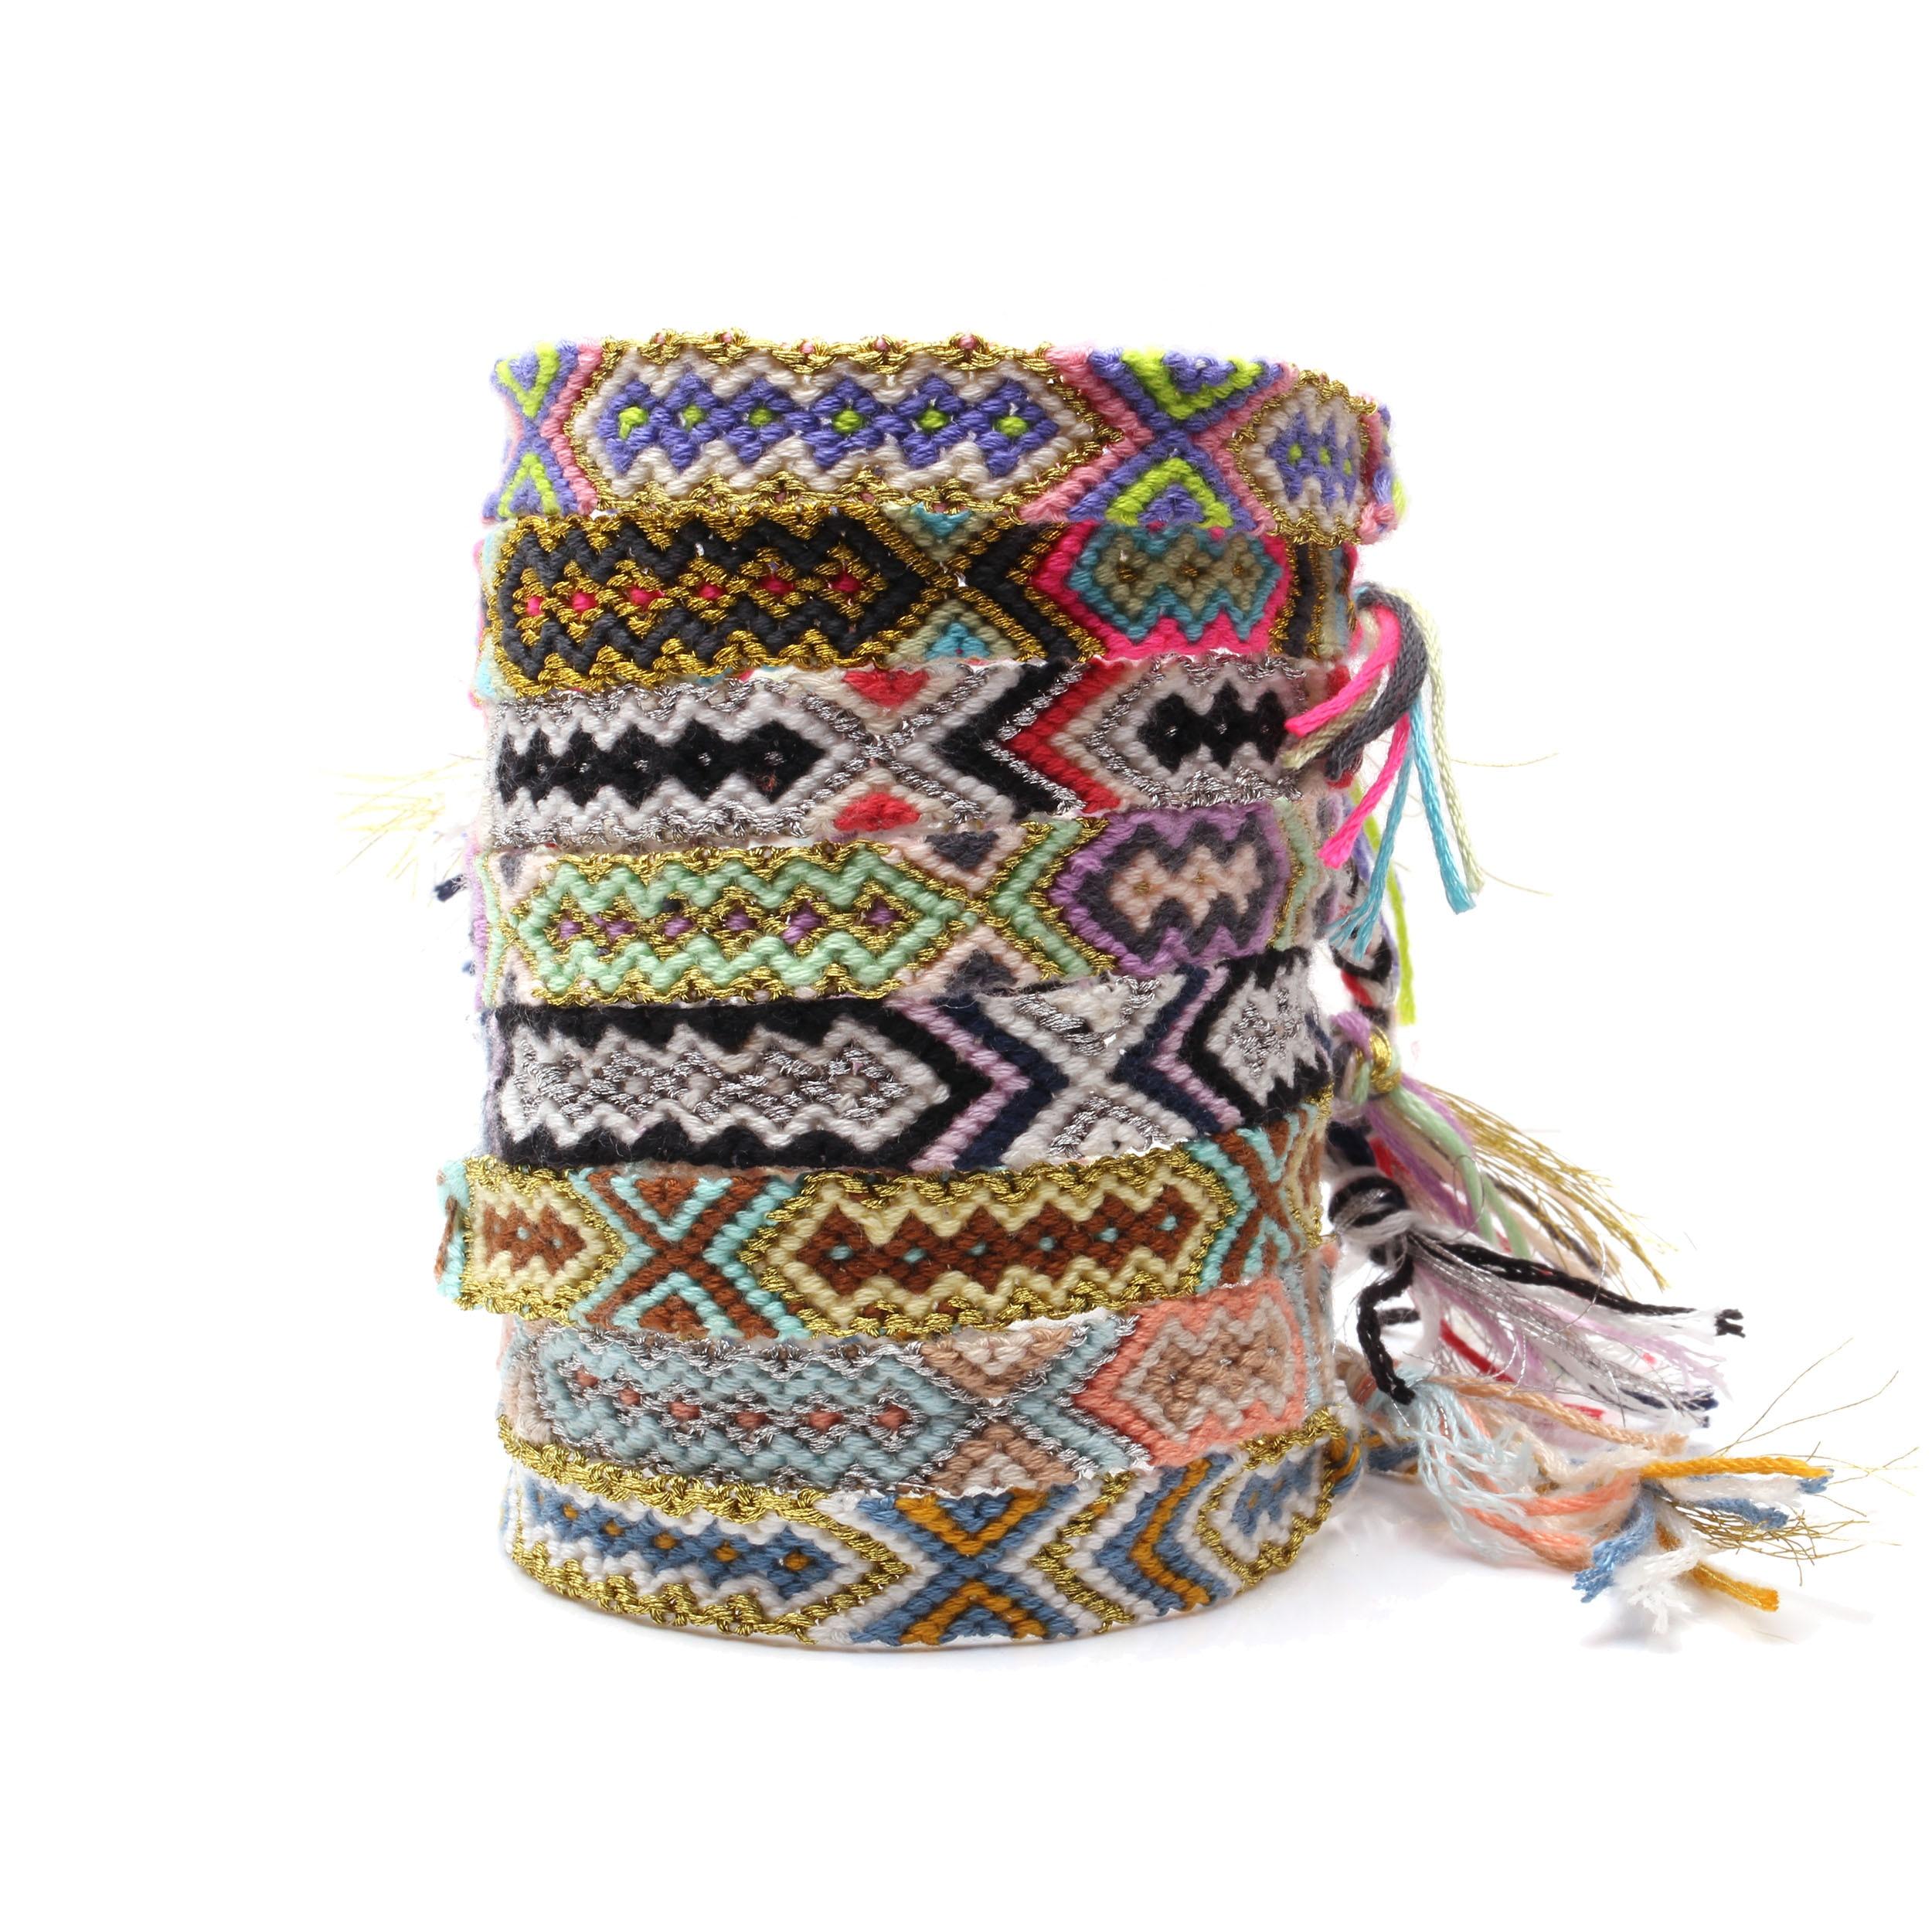 Boho Colorful Embroidery Thread Braided Friendship Bracelet Women Men Hippie Aztec Mayan Traditional Ethnic Woven Bracelets Gift